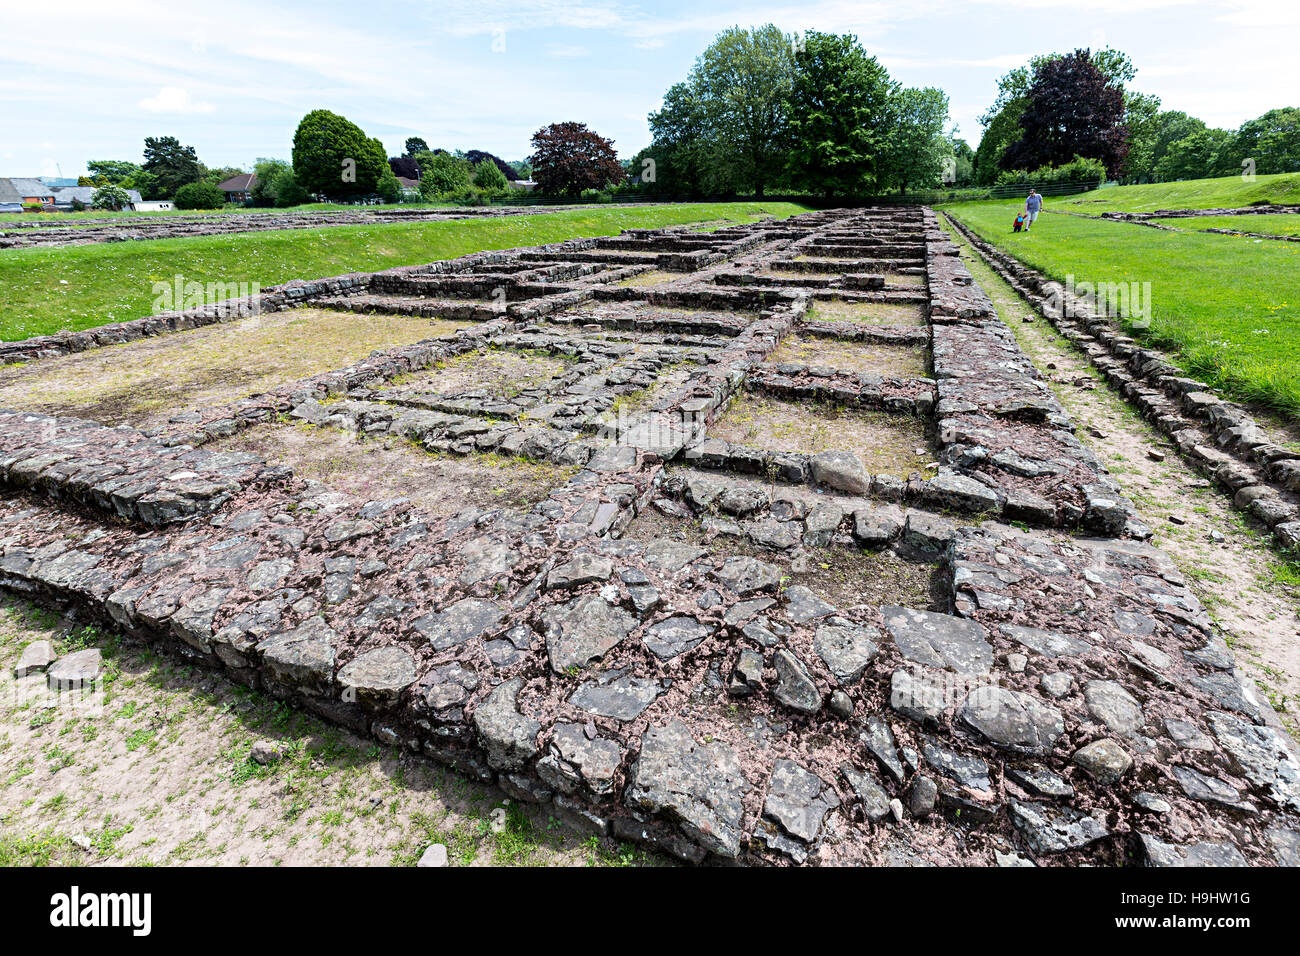 Roman barracks, Caerleon, Wales, UK - Stock Image